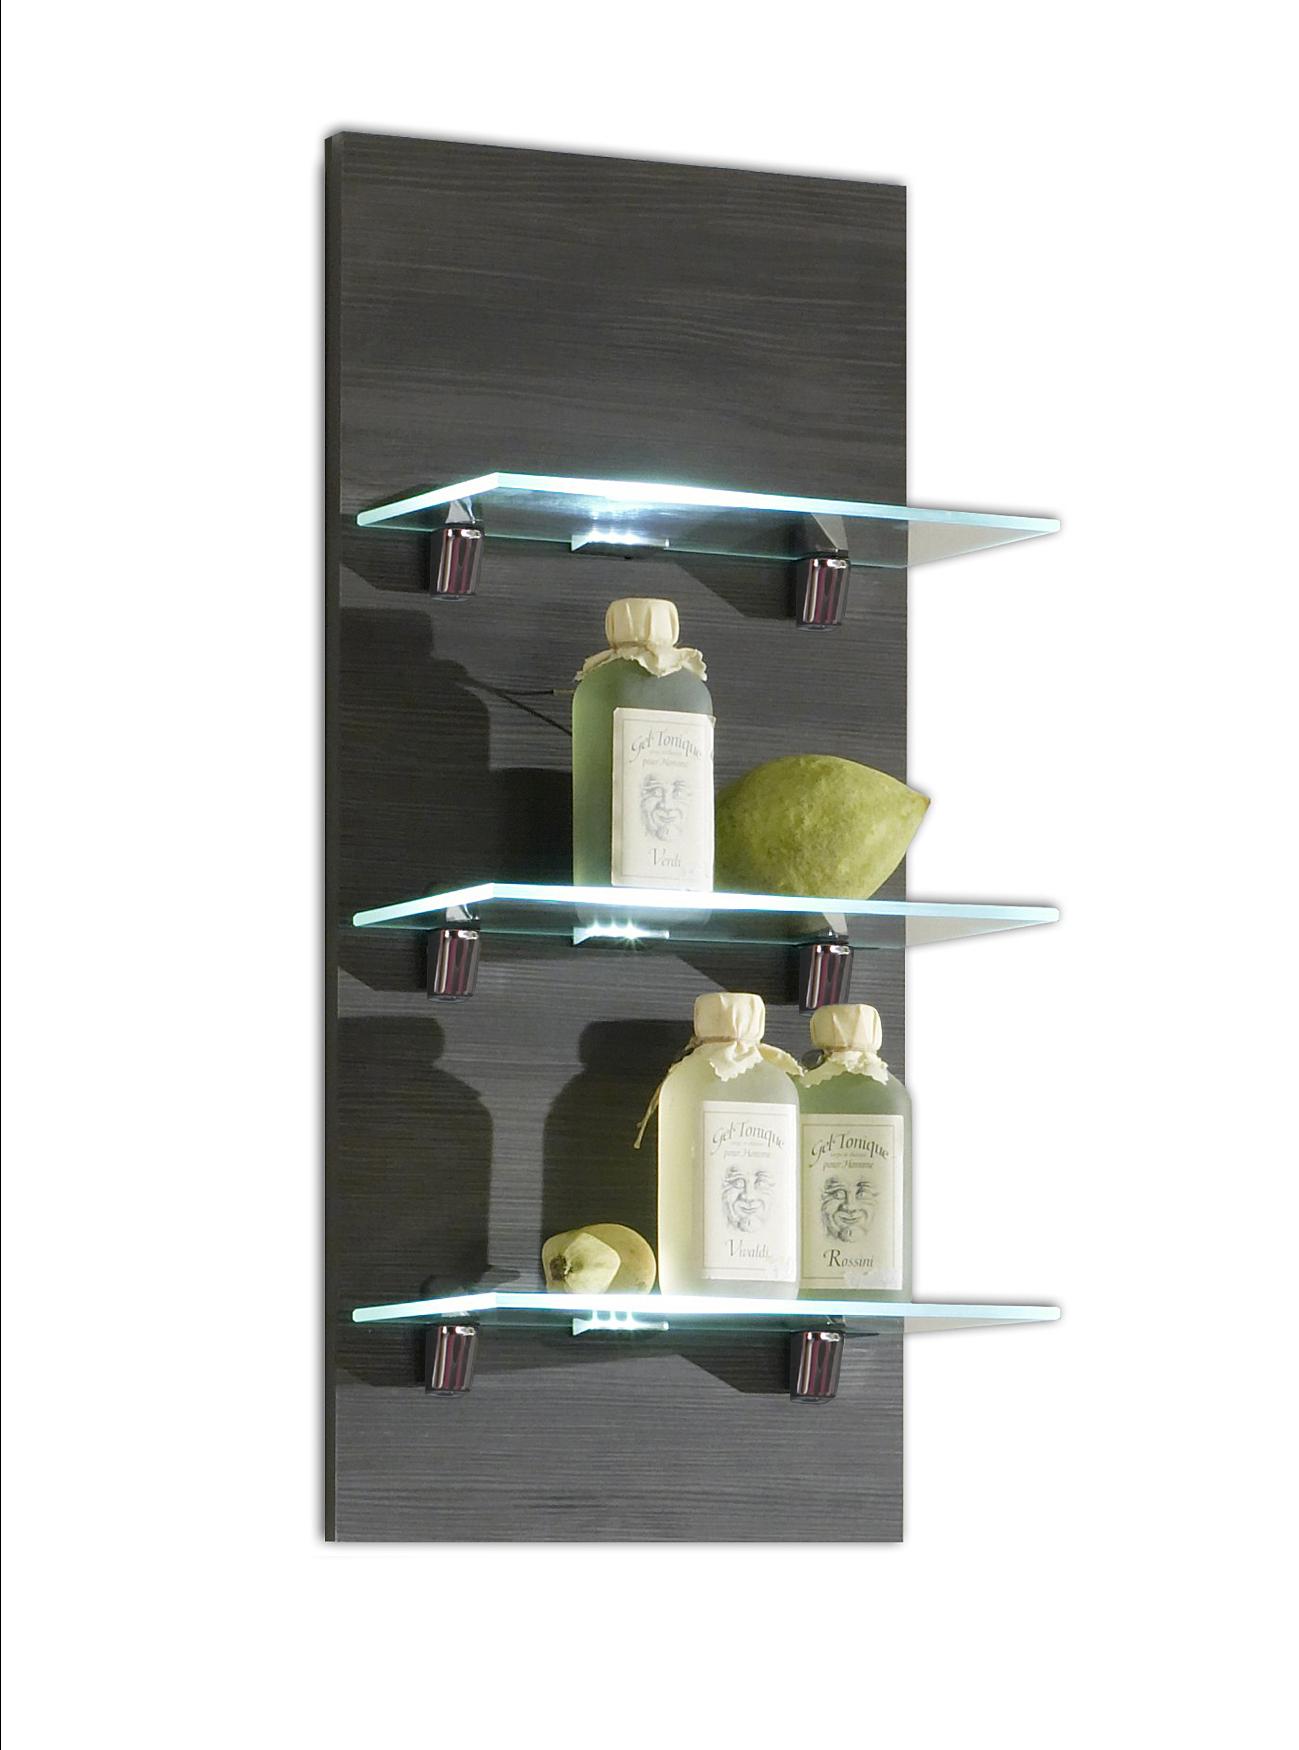 wandregal marano badezimmer regal 3 ablagefl chen mit led beleuchtung 30 cm grau ebay. Black Bedroom Furniture Sets. Home Design Ideas